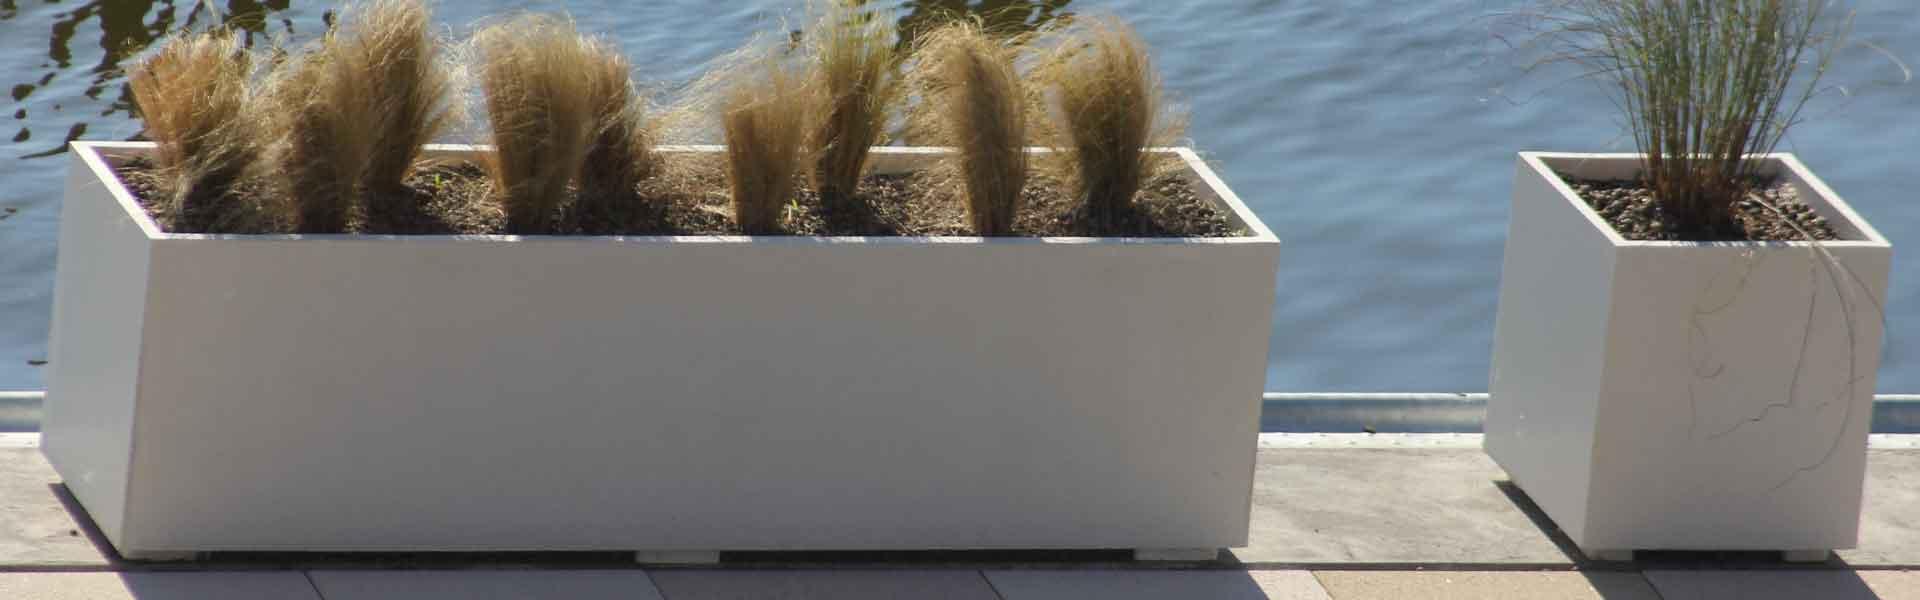 pflanzkübel aus beton 200cm x 50cm x 50cm+ 50cm x 50cm x 50cm